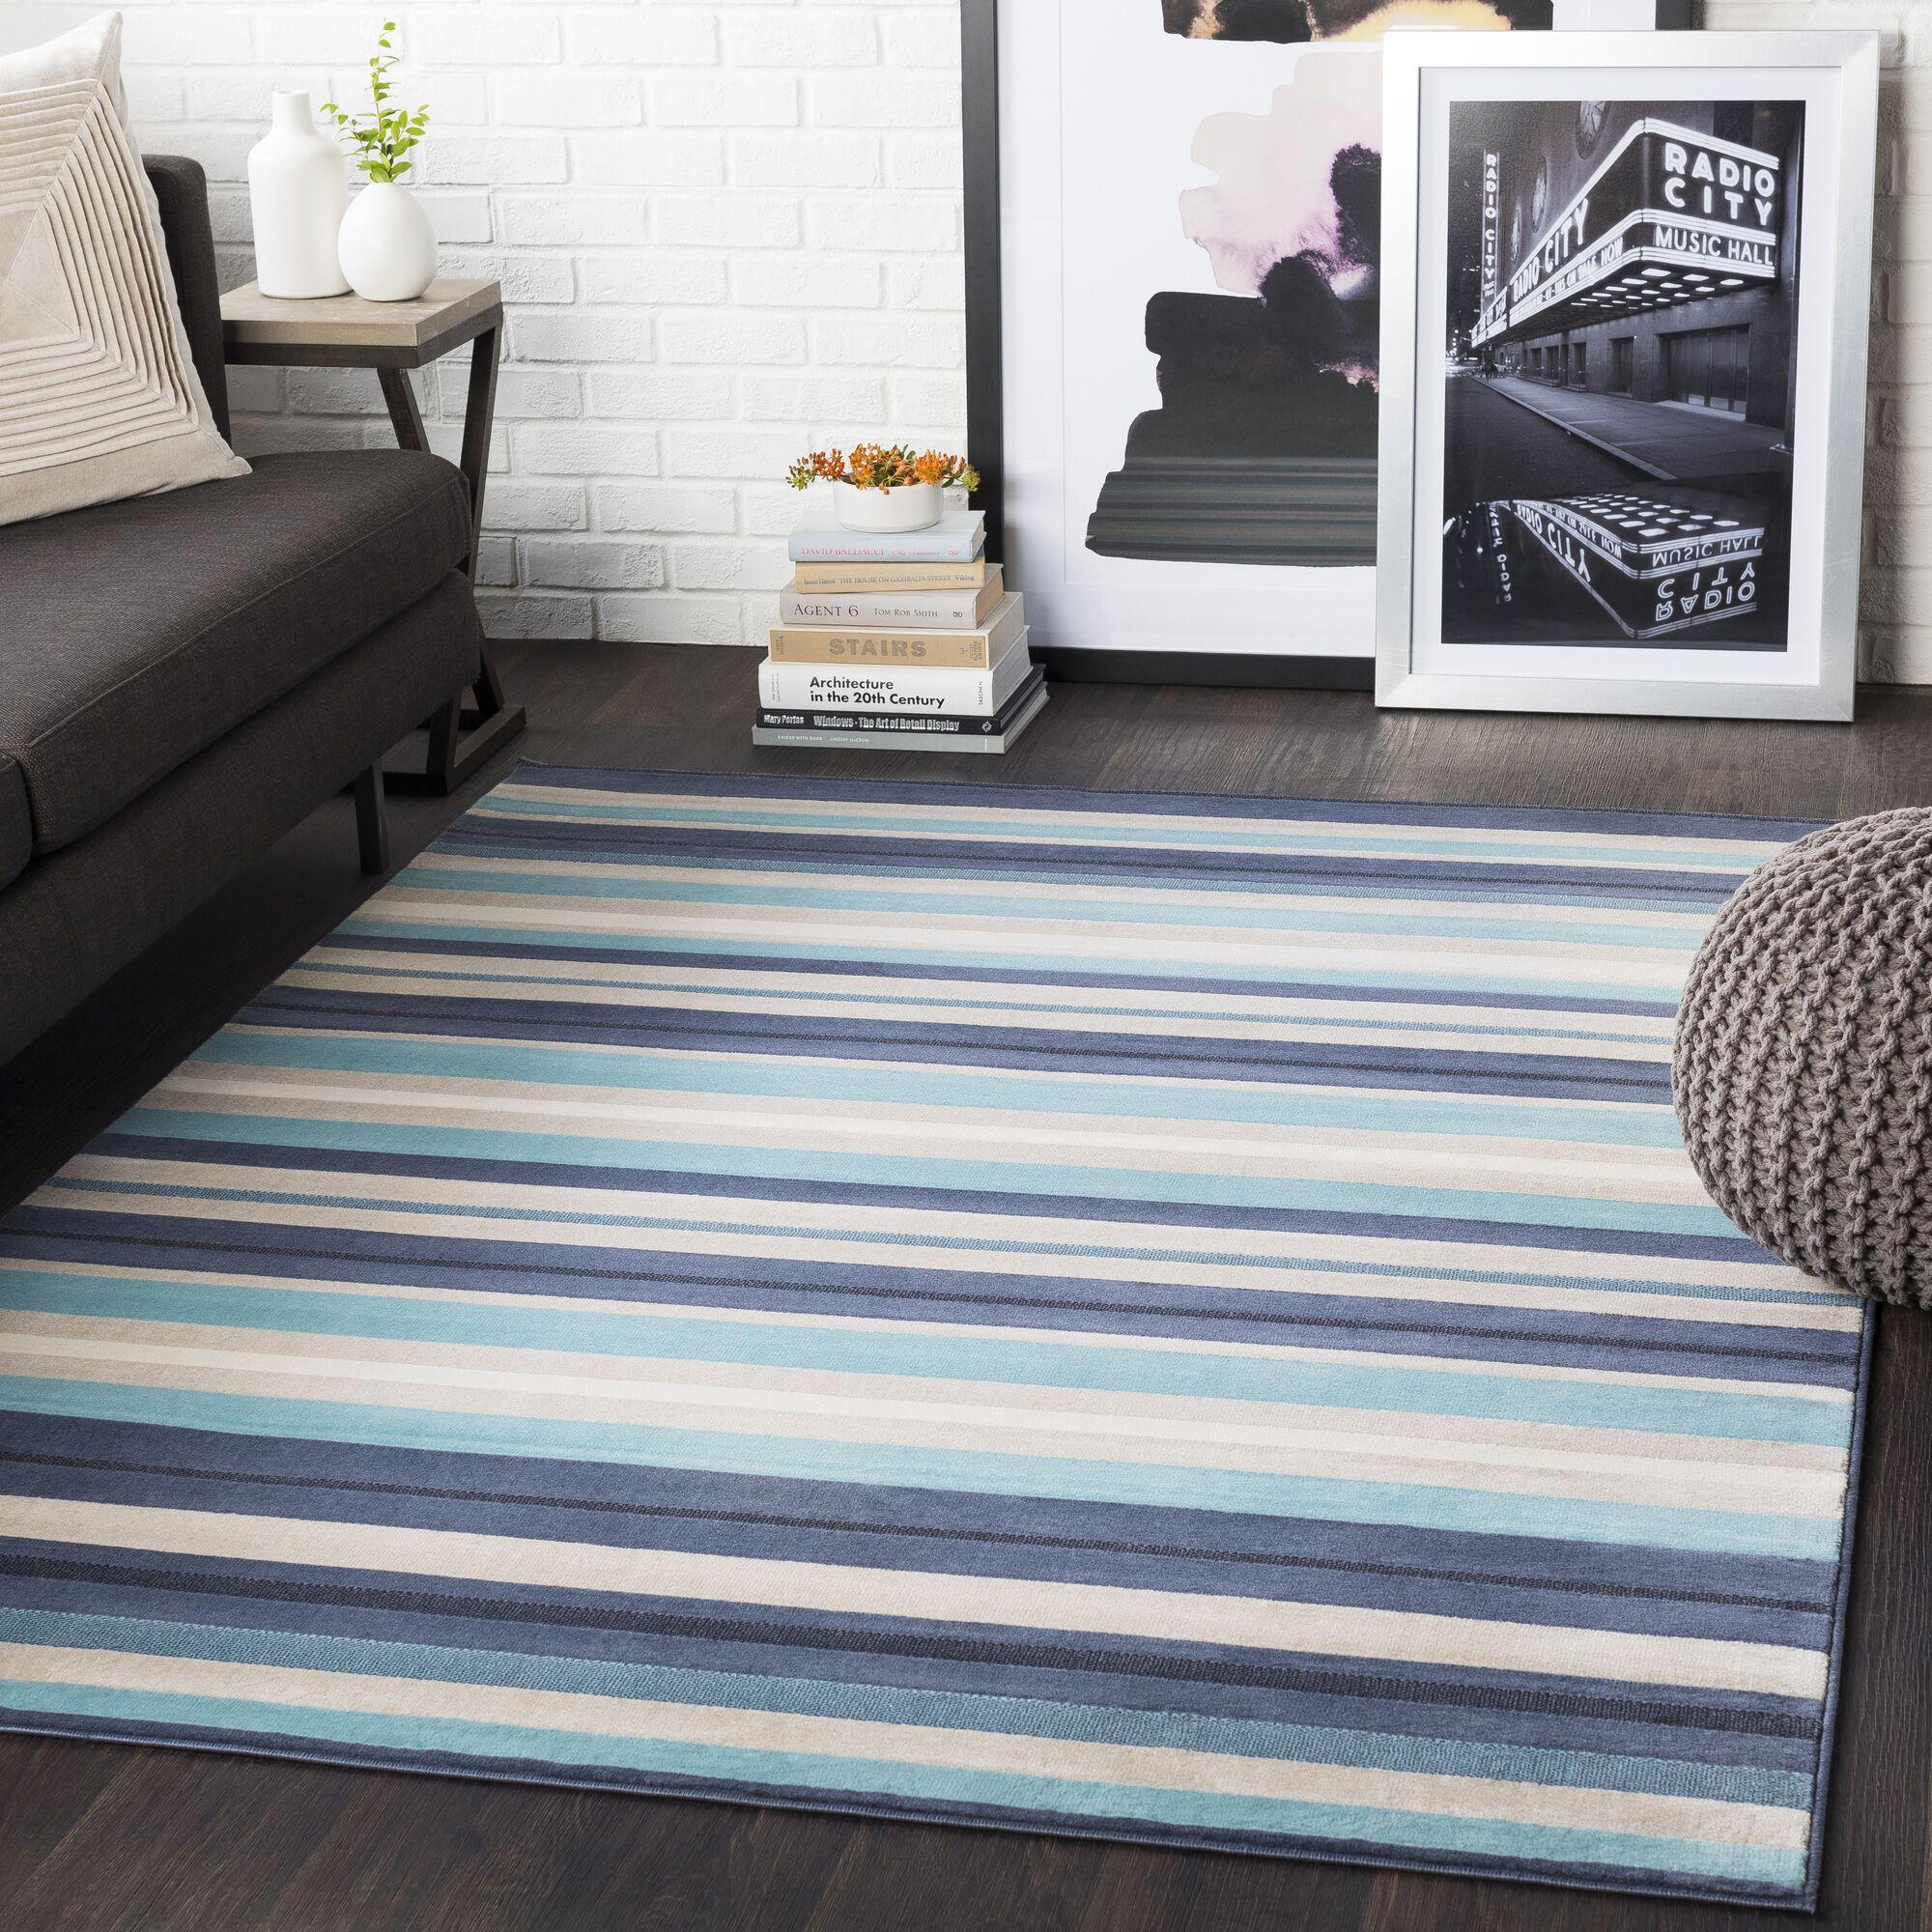 Bahr Striped Aqua/Charcoal Area Rug Rug Size: Rectangle 7'10